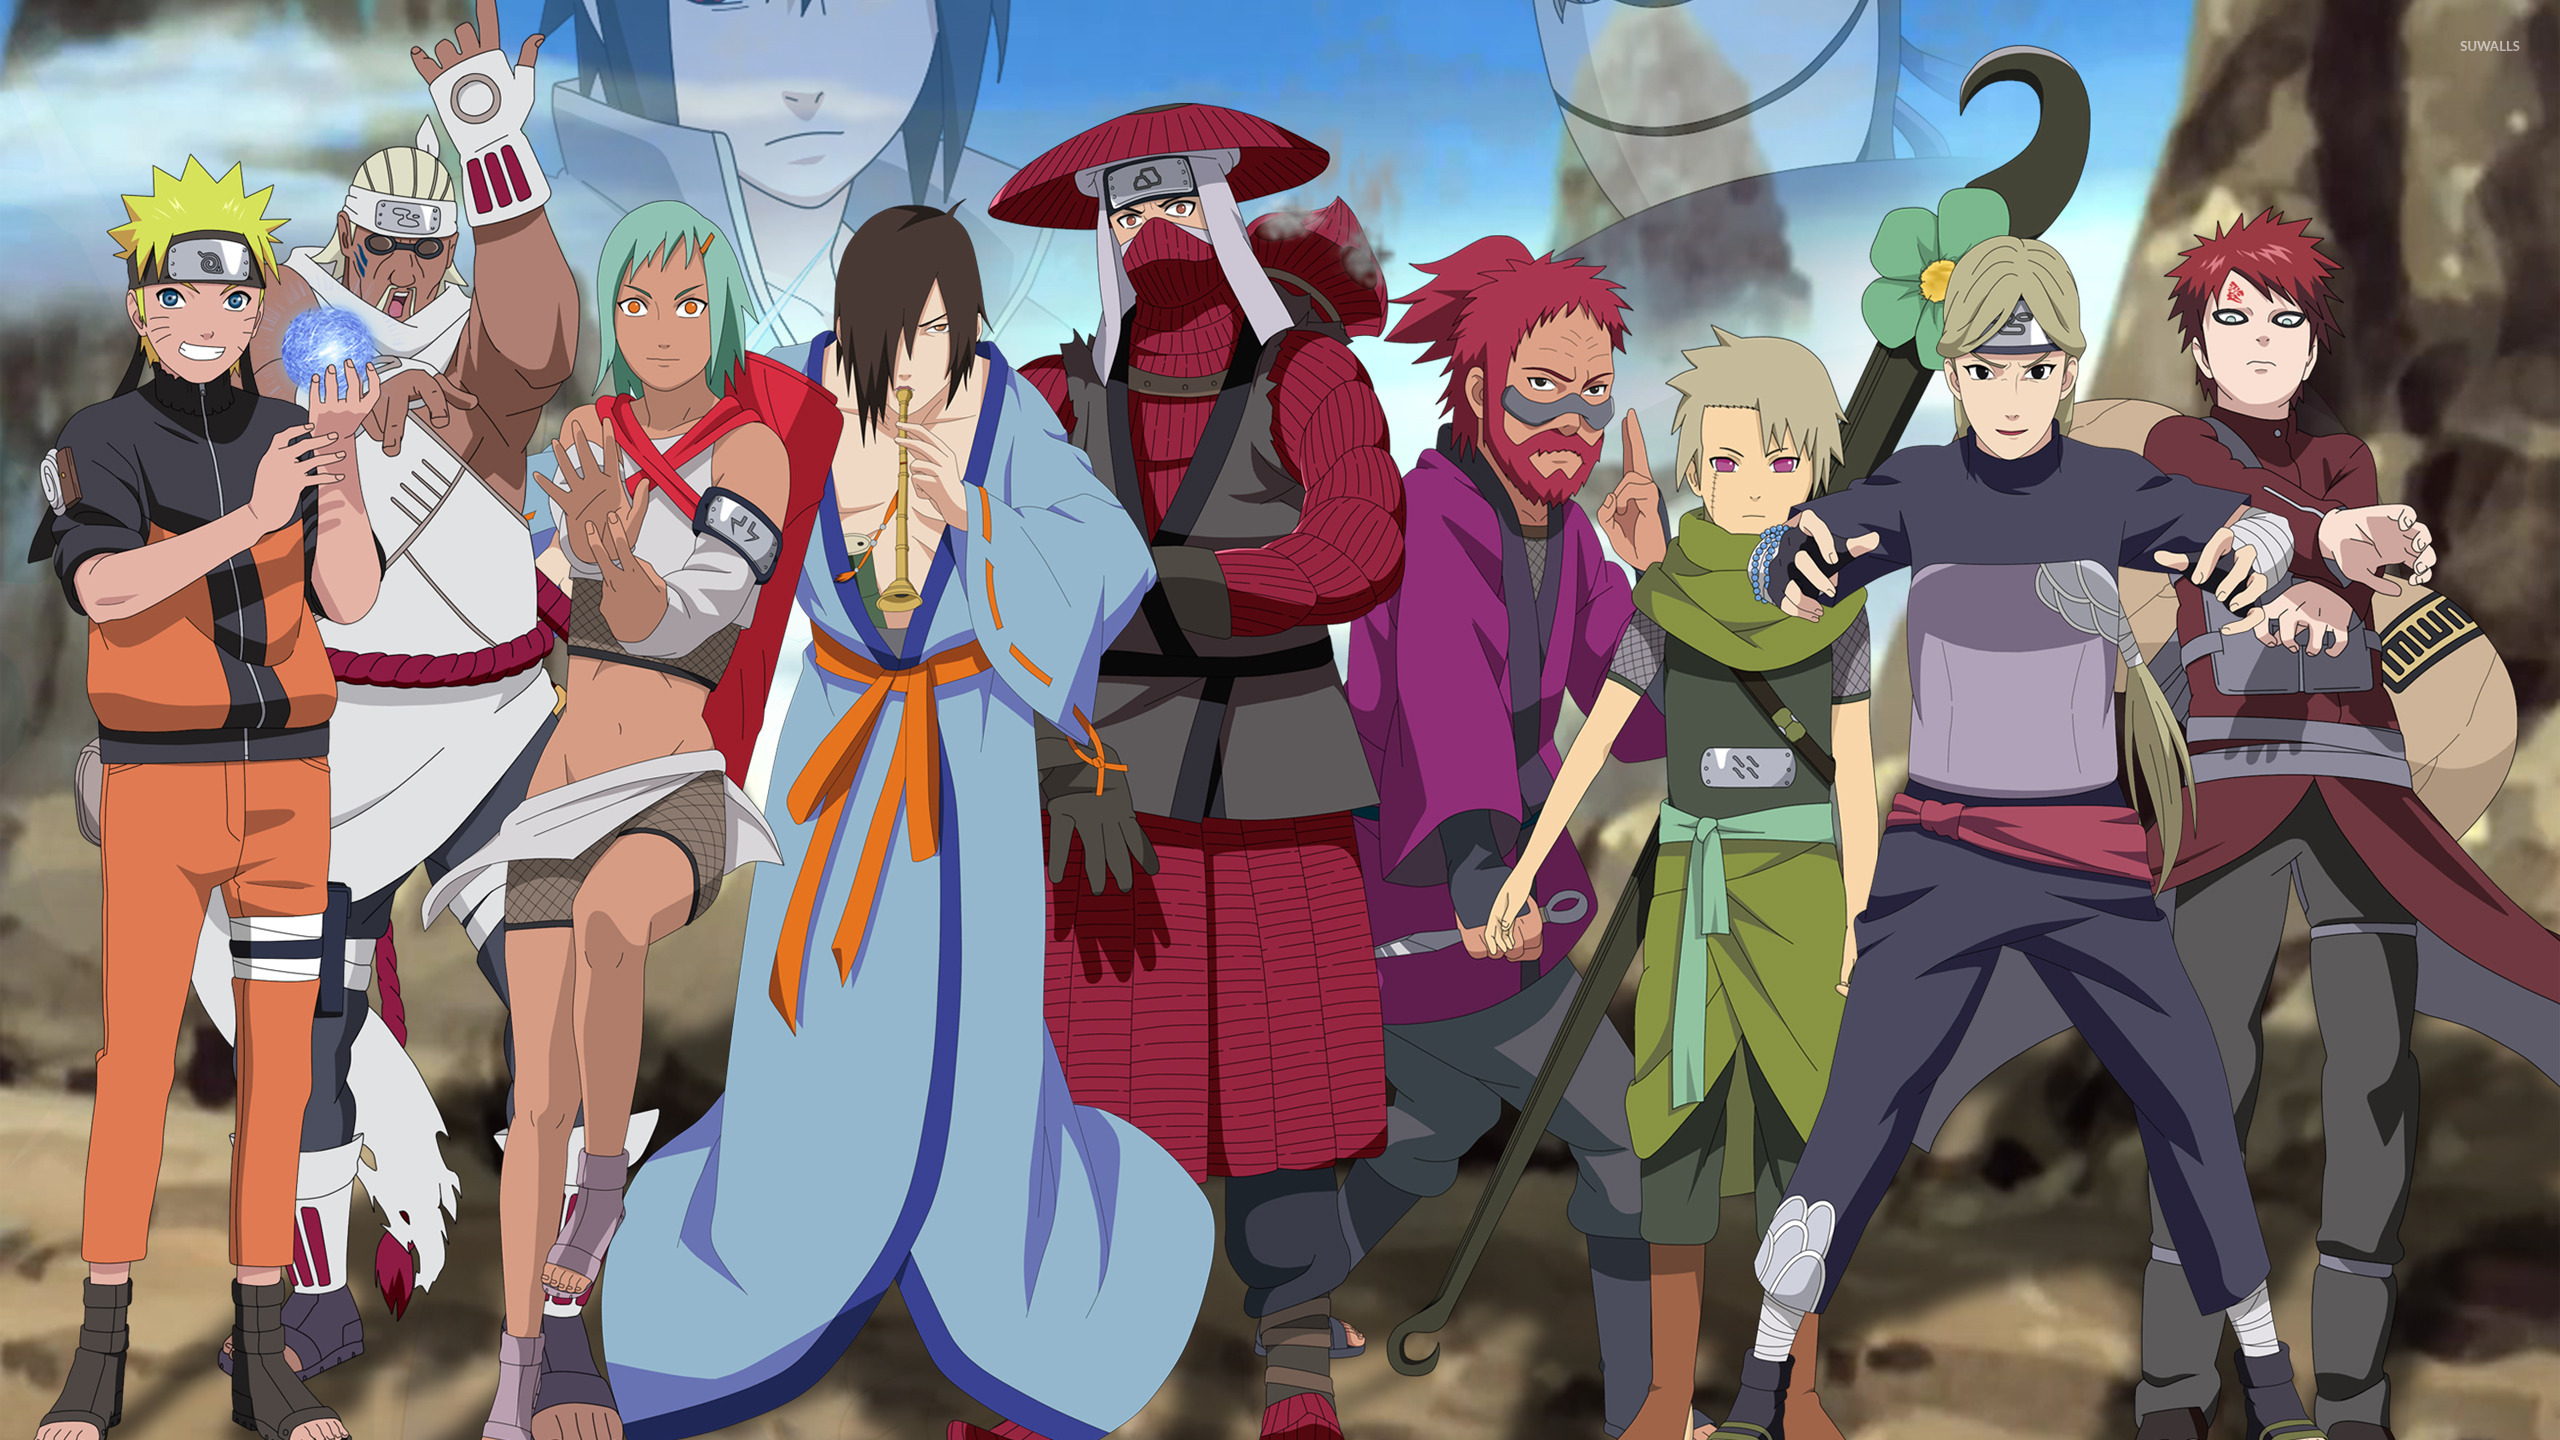 Naruto Shippuden wallpaper - Anime